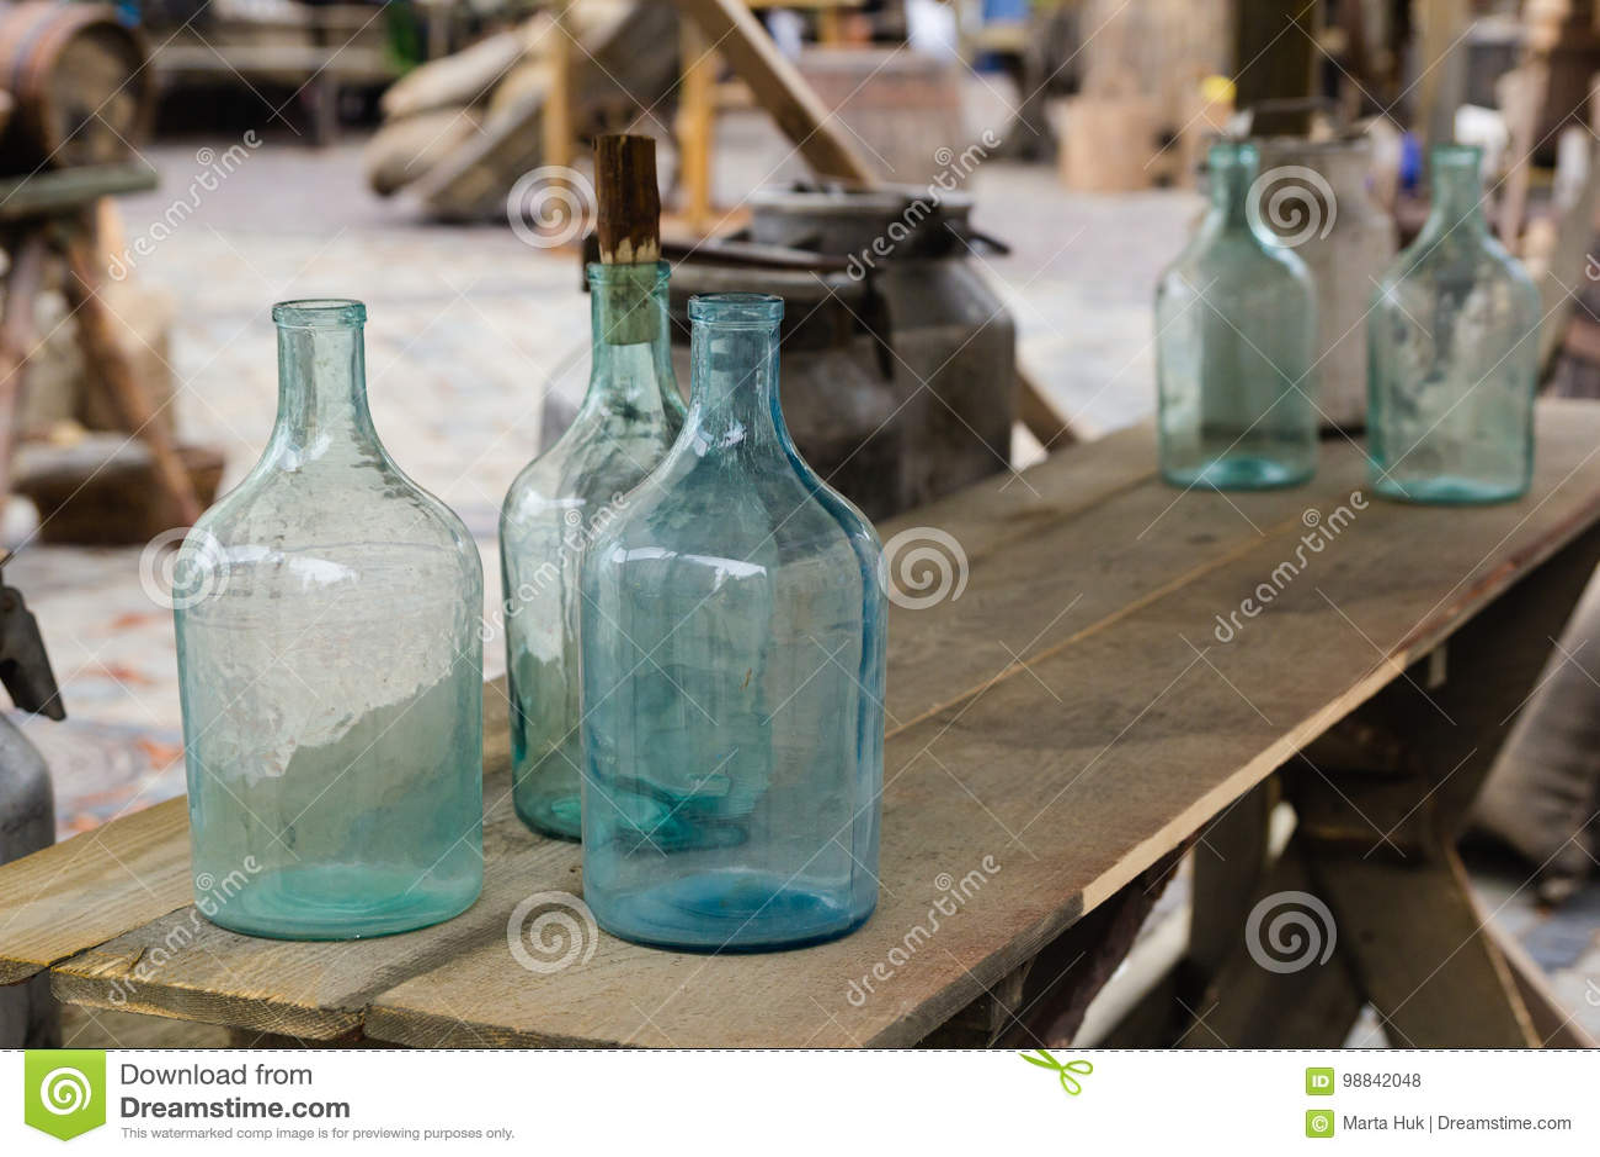 Duża pusta szklana butelka